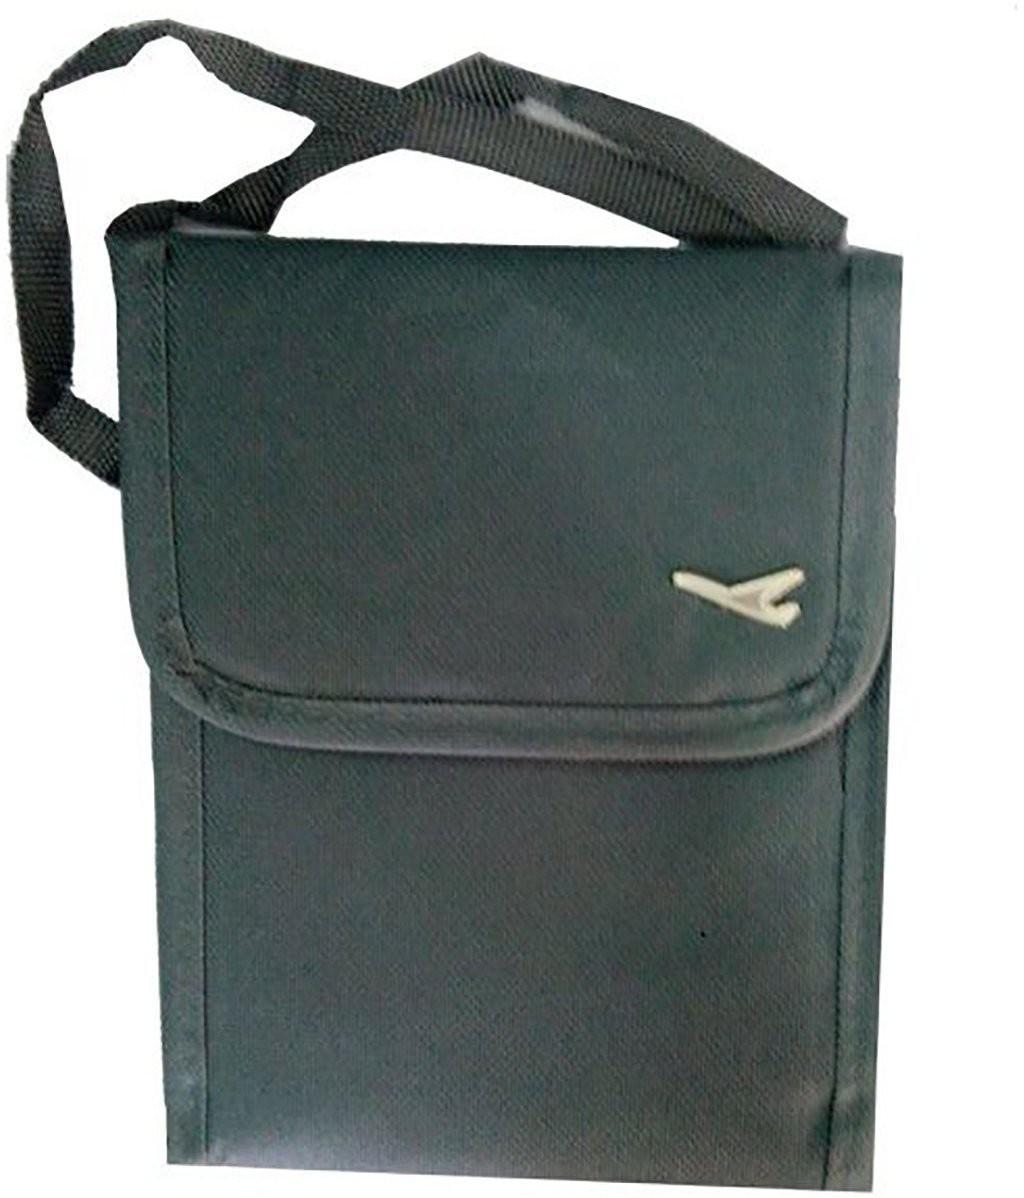 Sling bag below 500 - Vmore Women Grey Polyester Sling Bag